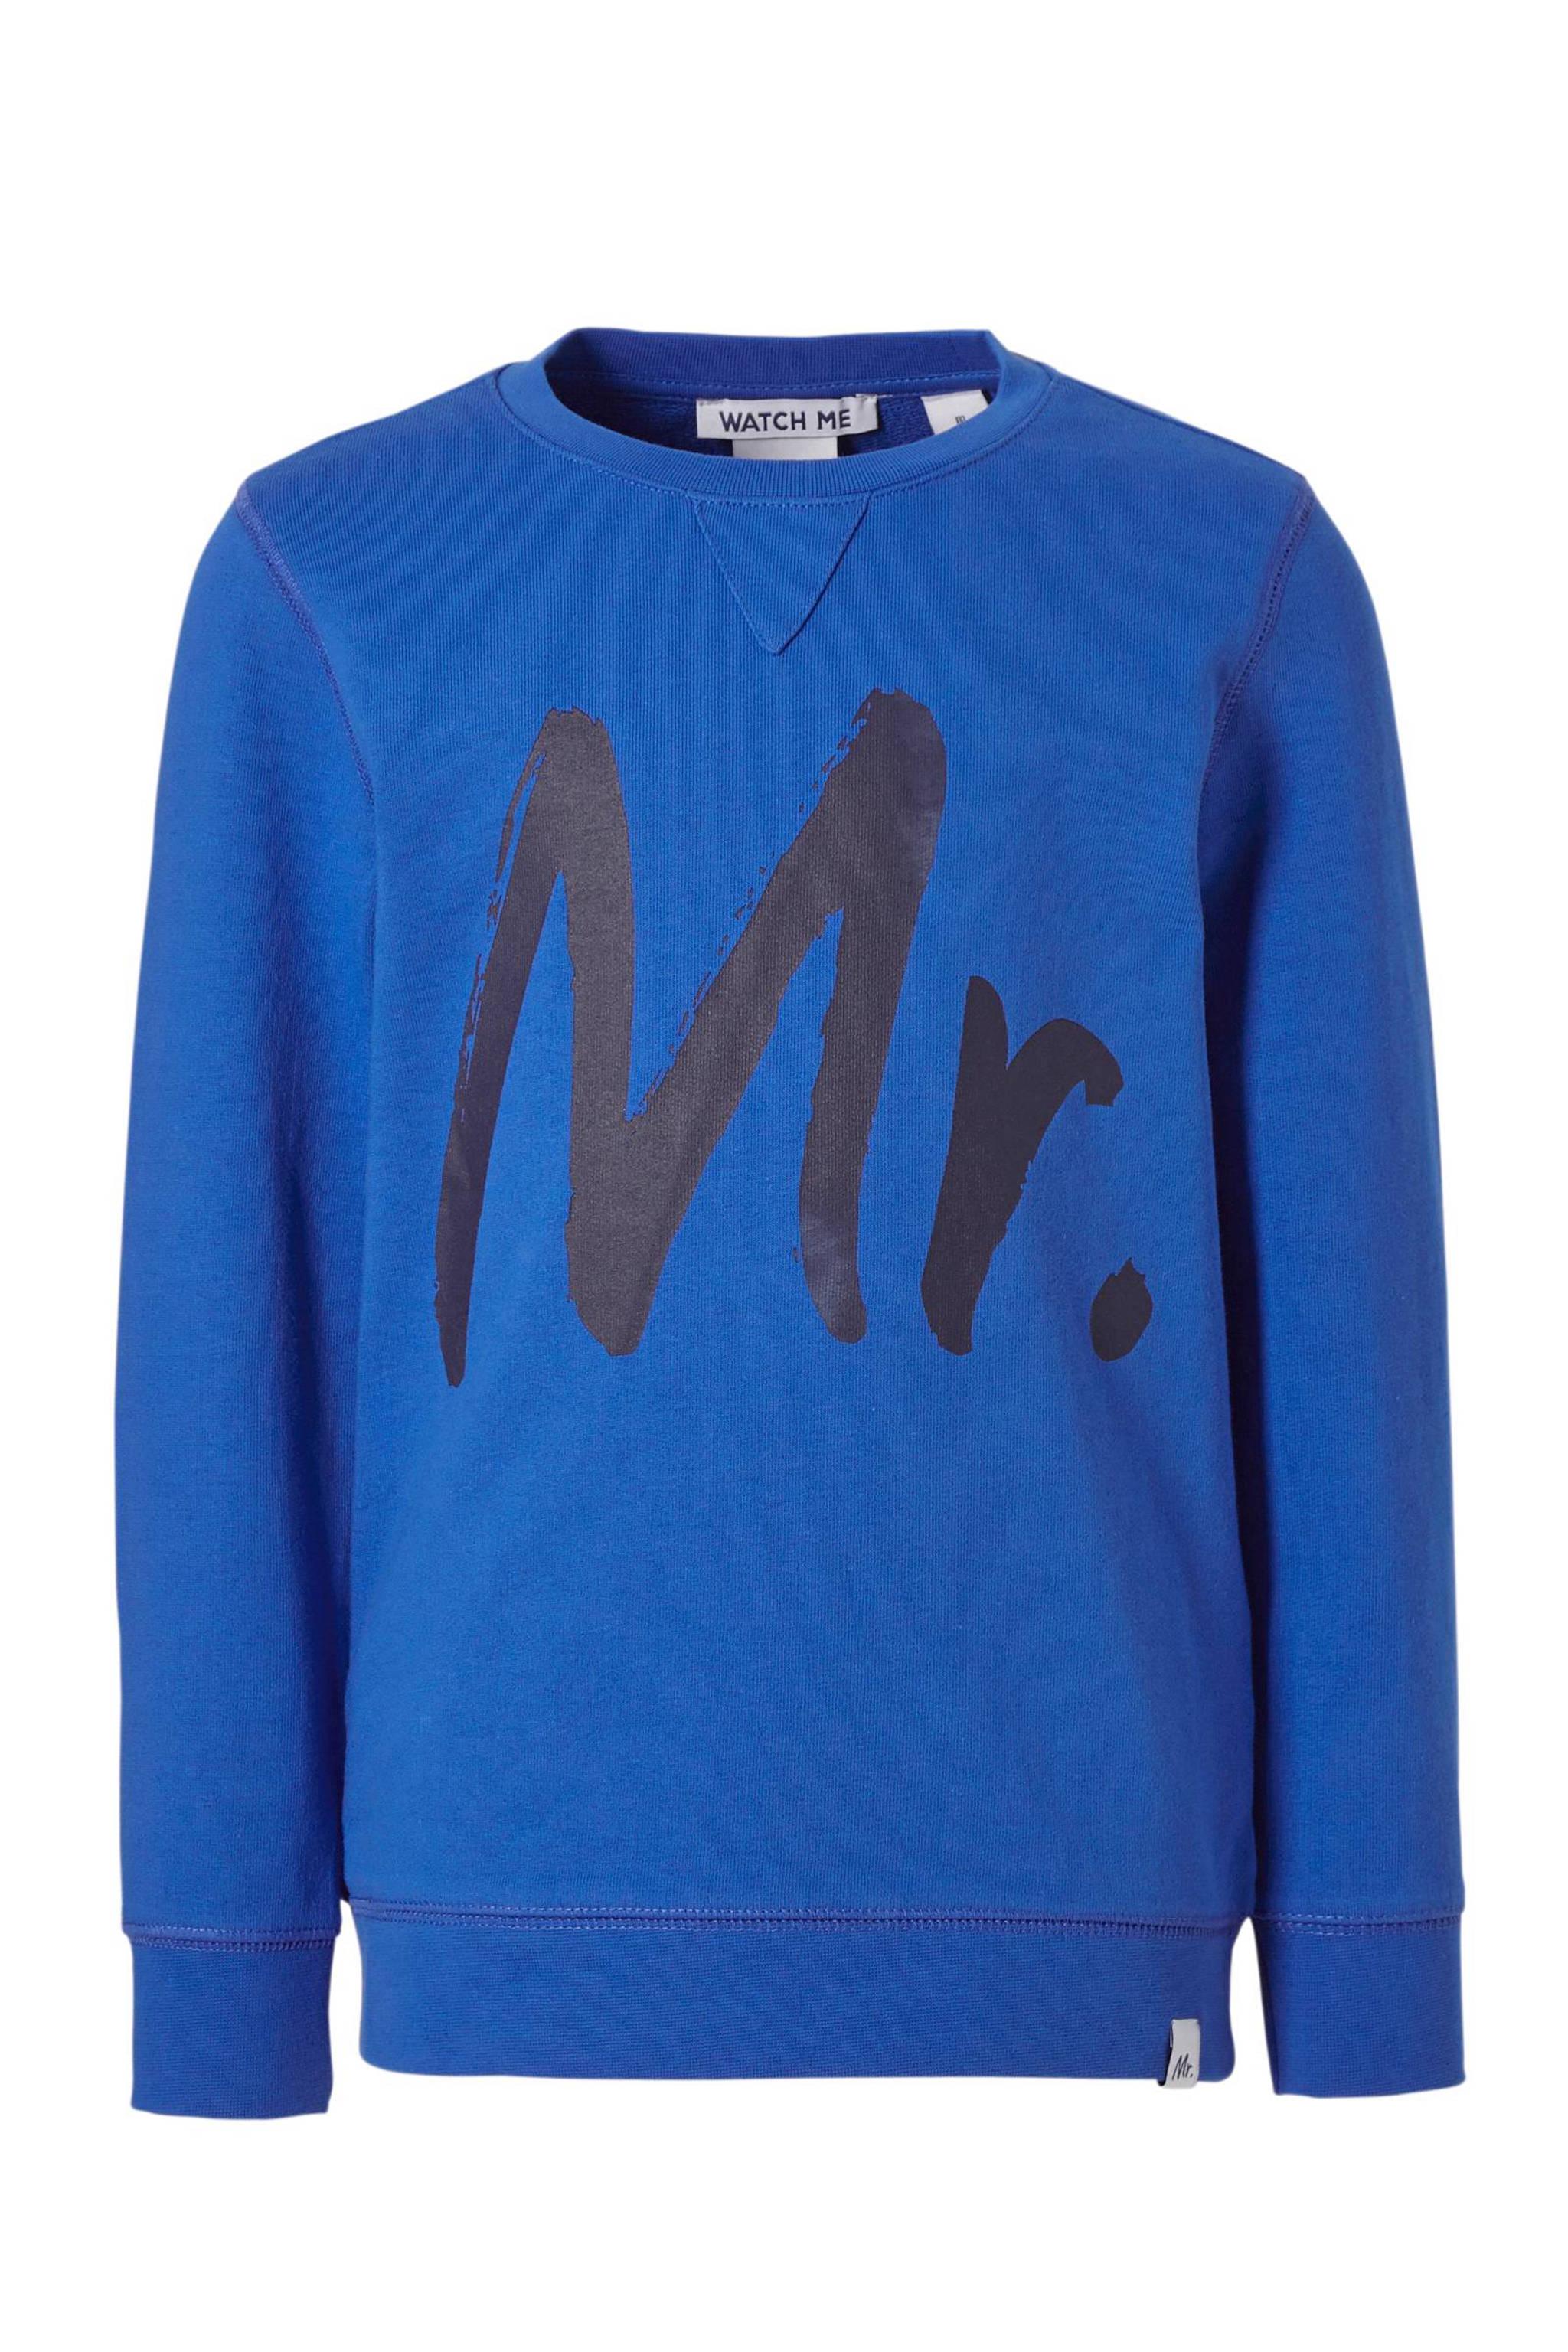 9d05d97769d NIK&NIK sweater George met tekst blauw | wehkamp